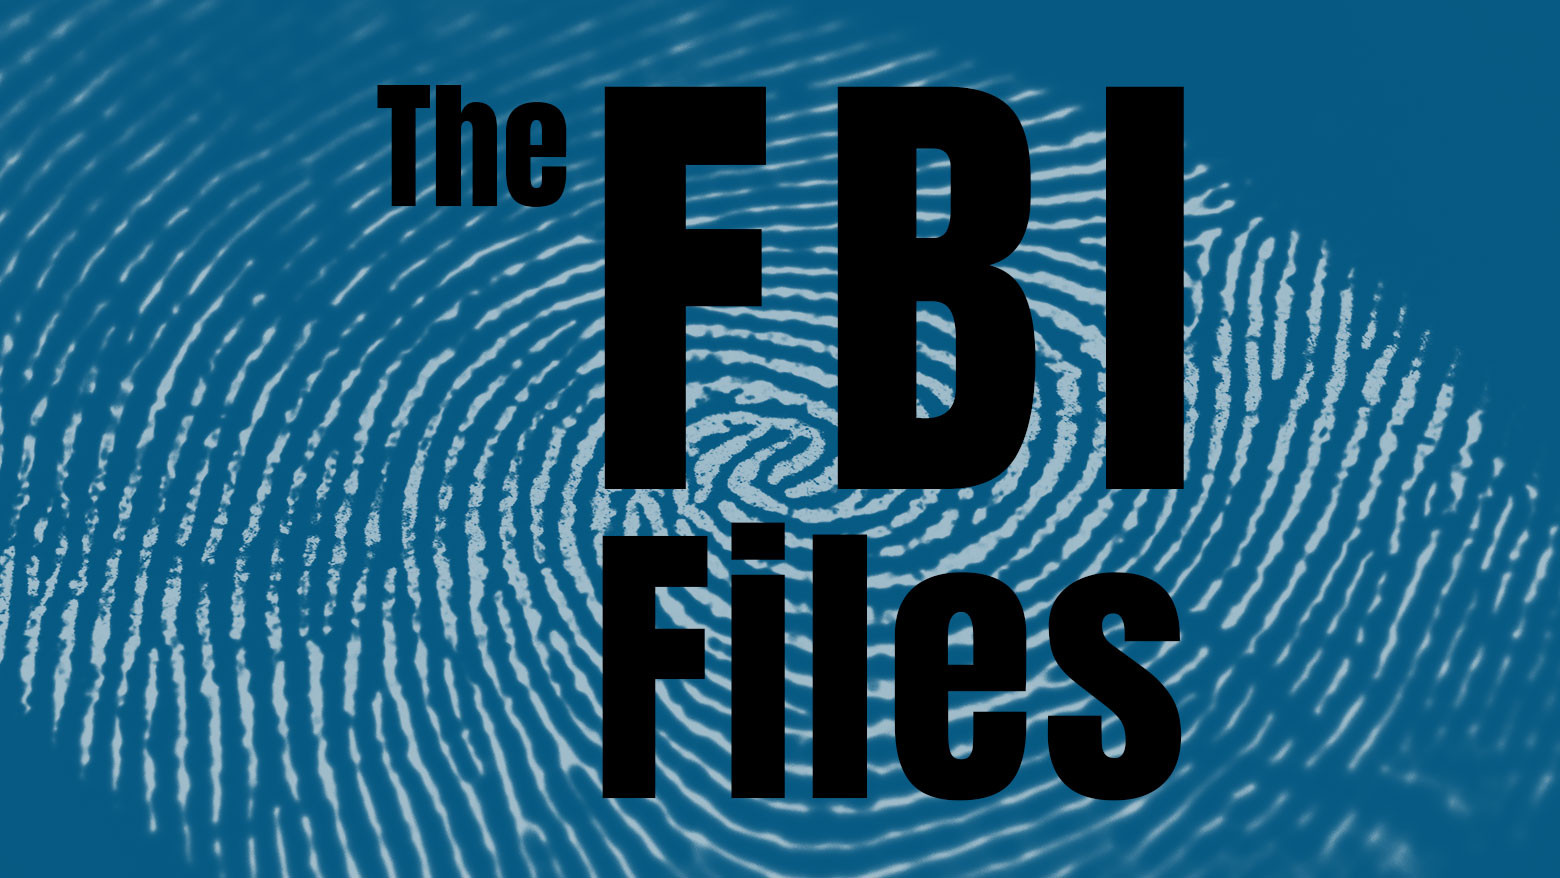 the FBI files featuredImage.jpg